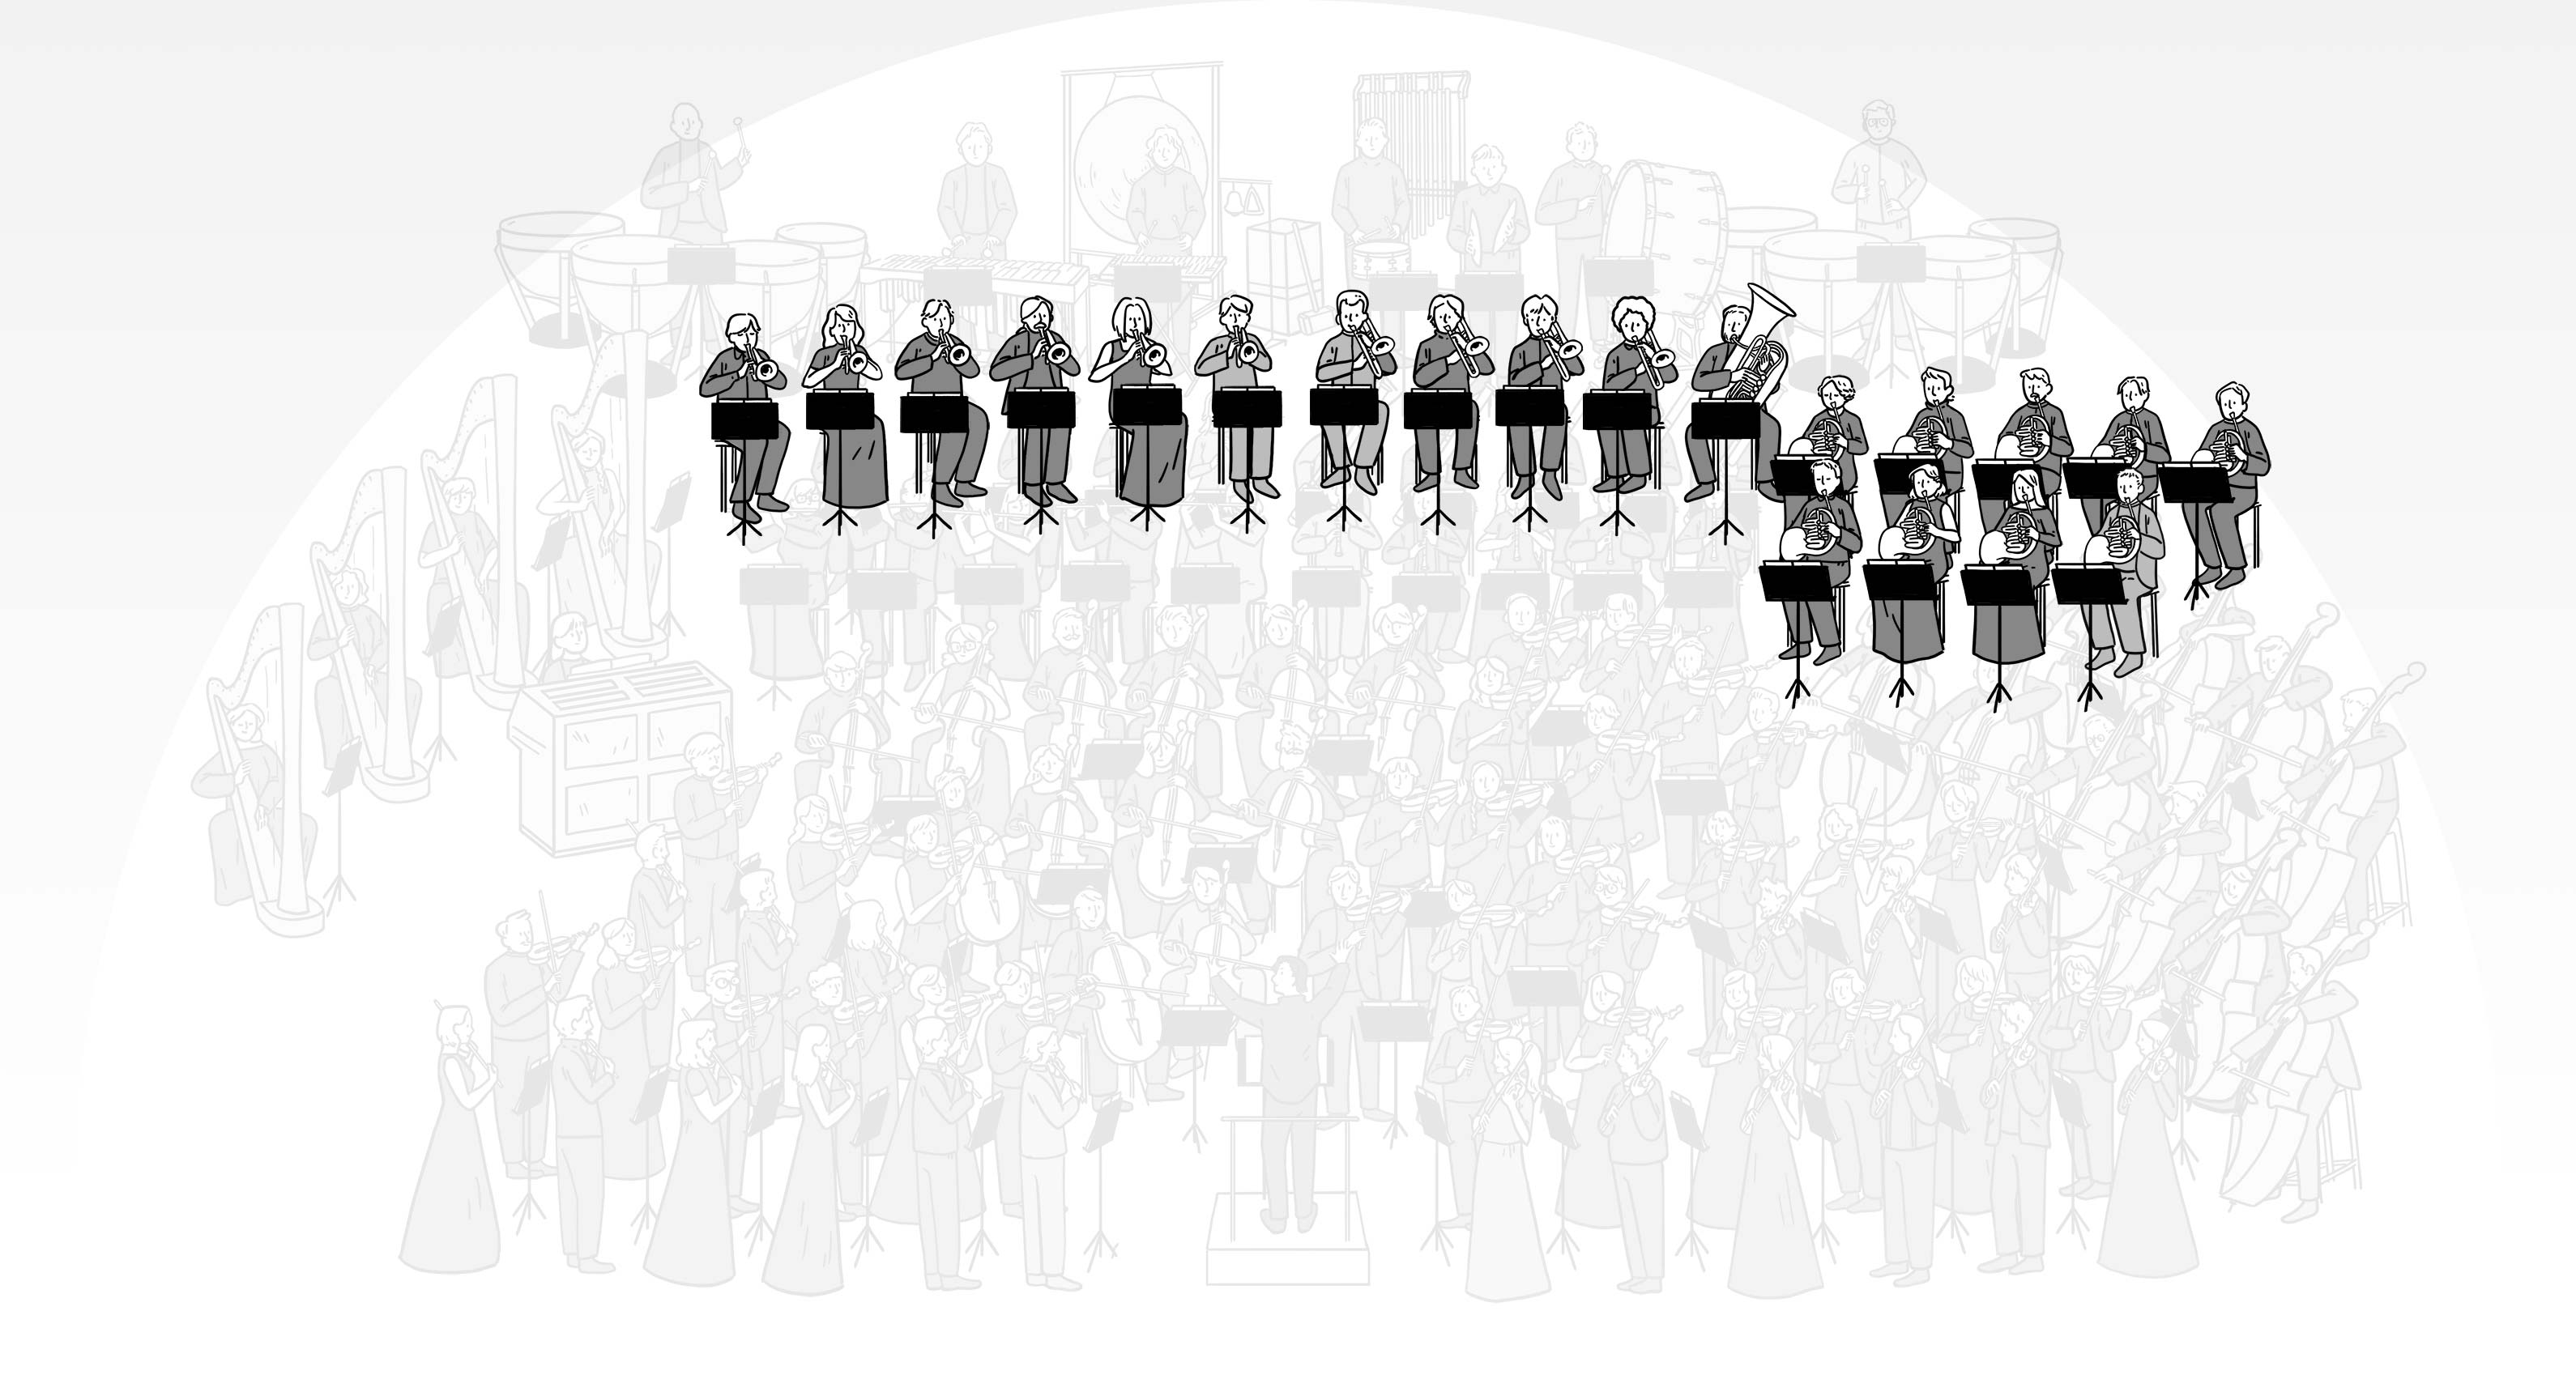 Orchestra 05 brass